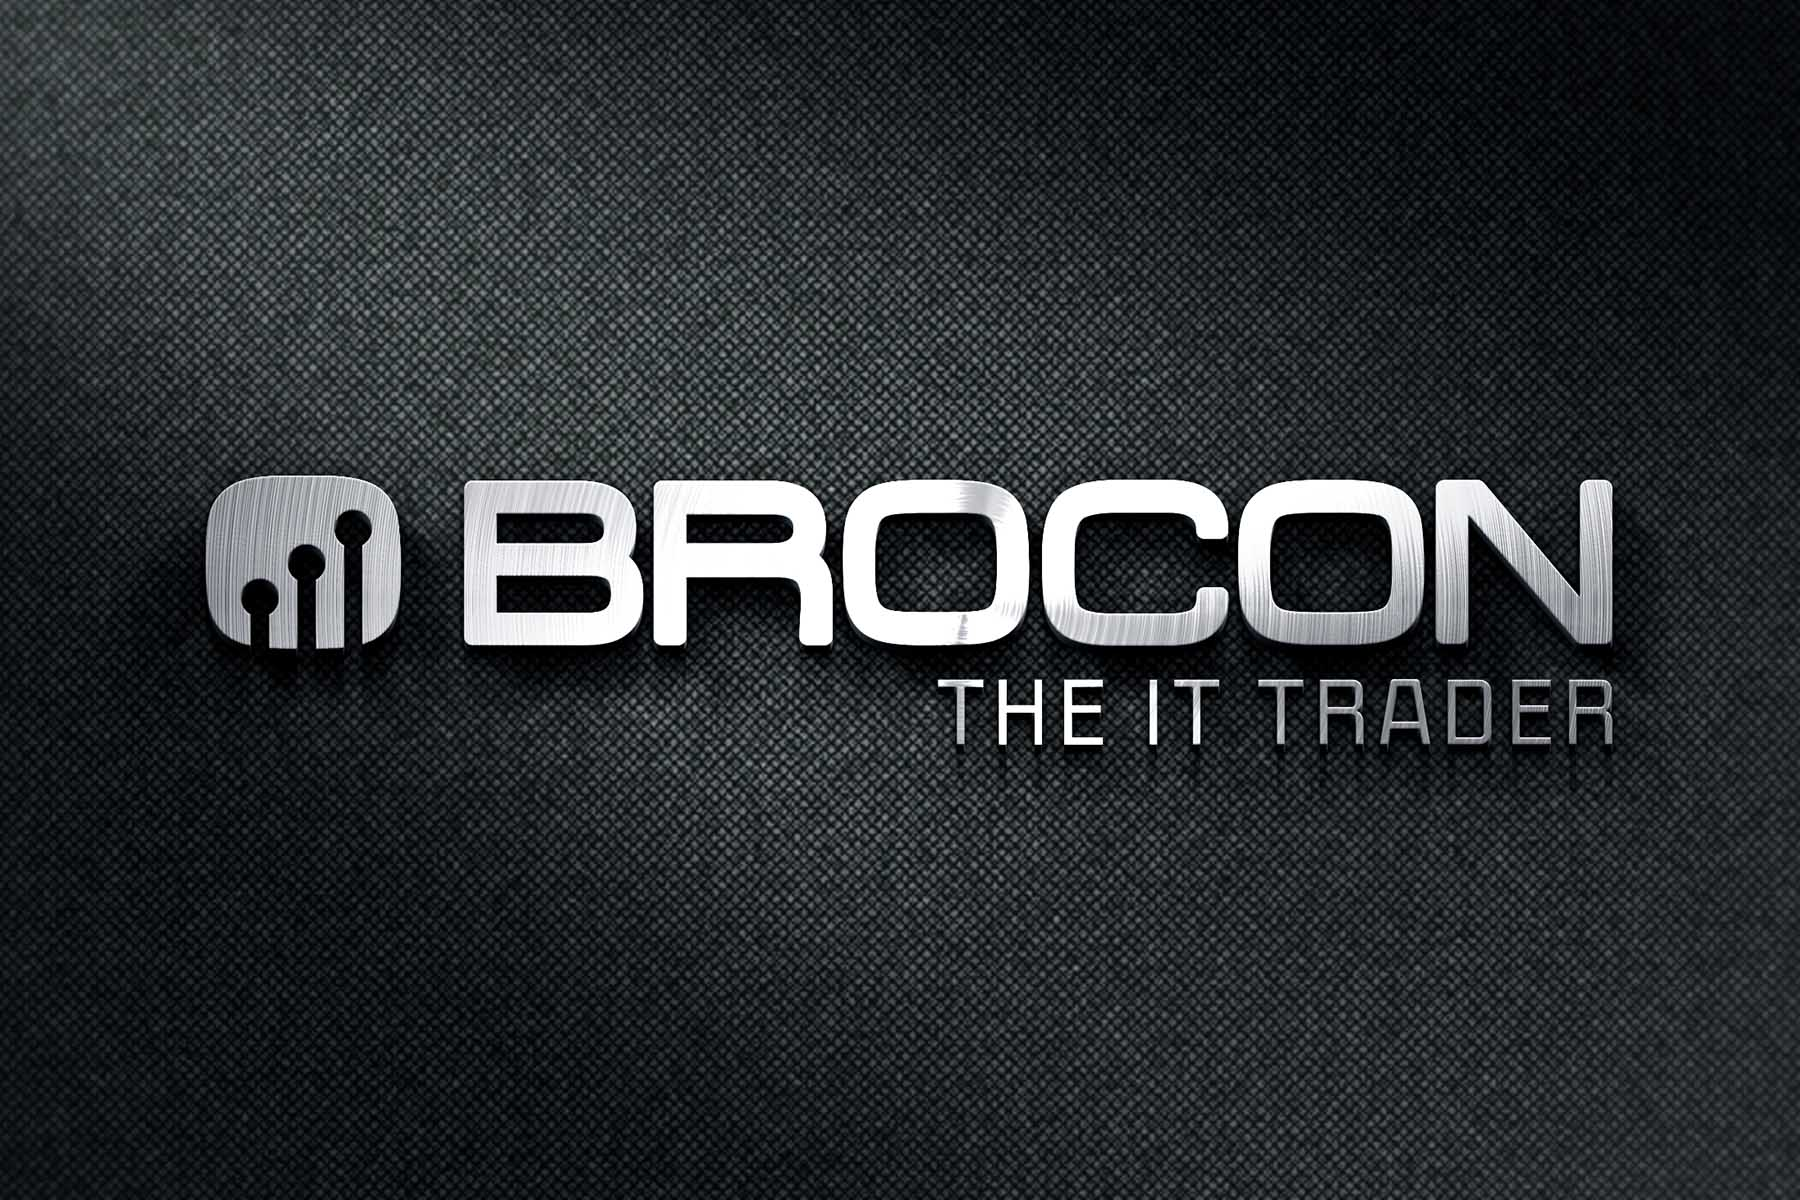 eh_referenzen_bro_1 Projekt - Brocon it